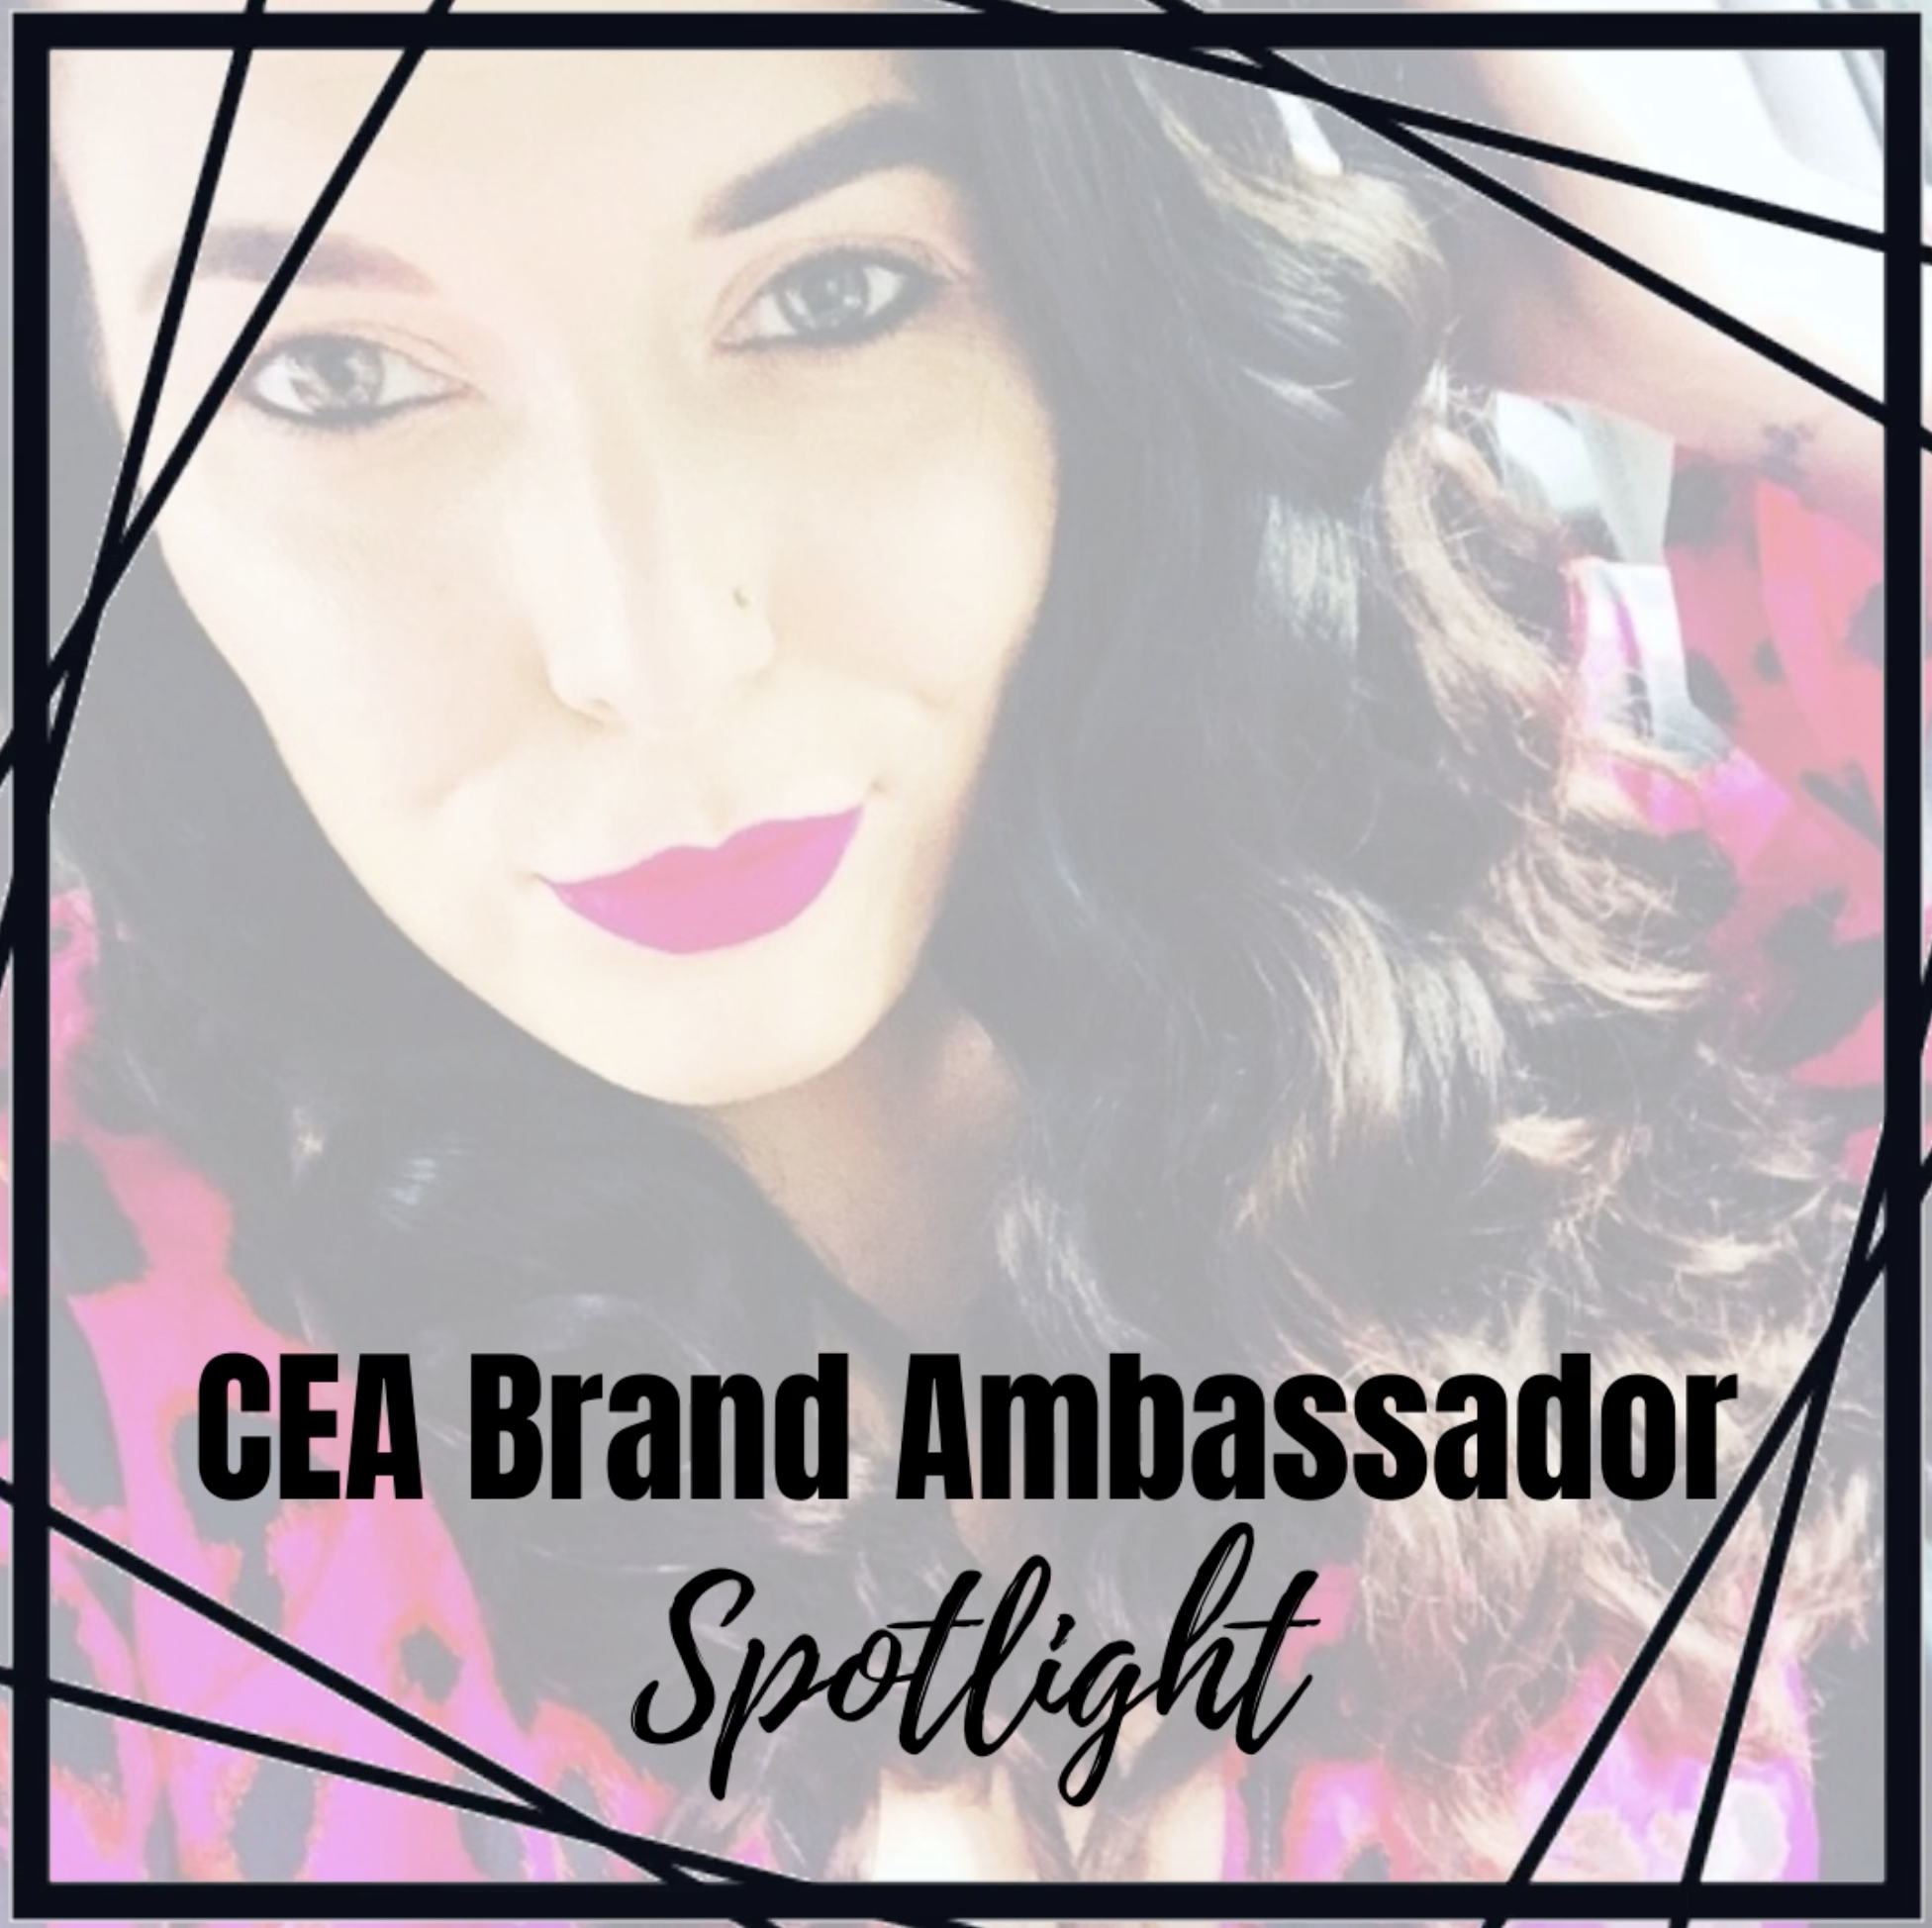 Brand ambassador cea staffing tour managers